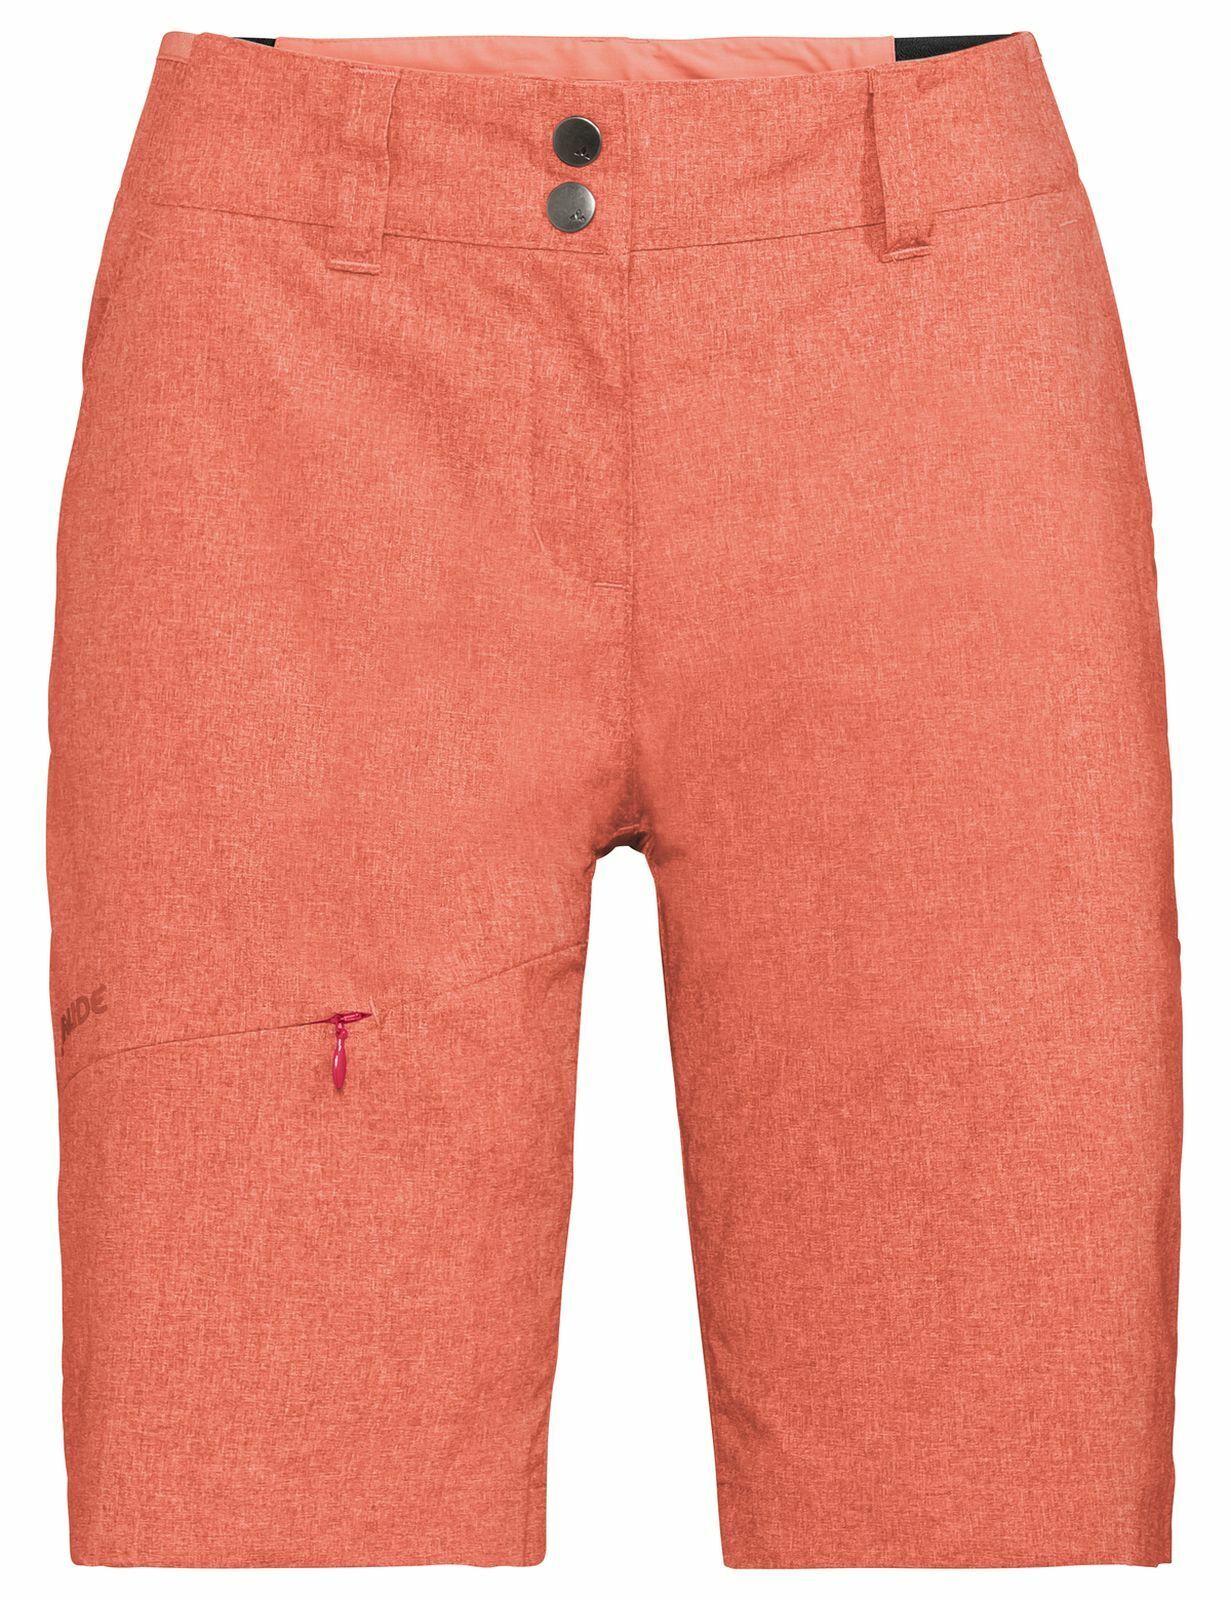 Vaude Womens Hiking Outdoor Leisure Short Women's Skomer Shorts  II Pink  offering 100%